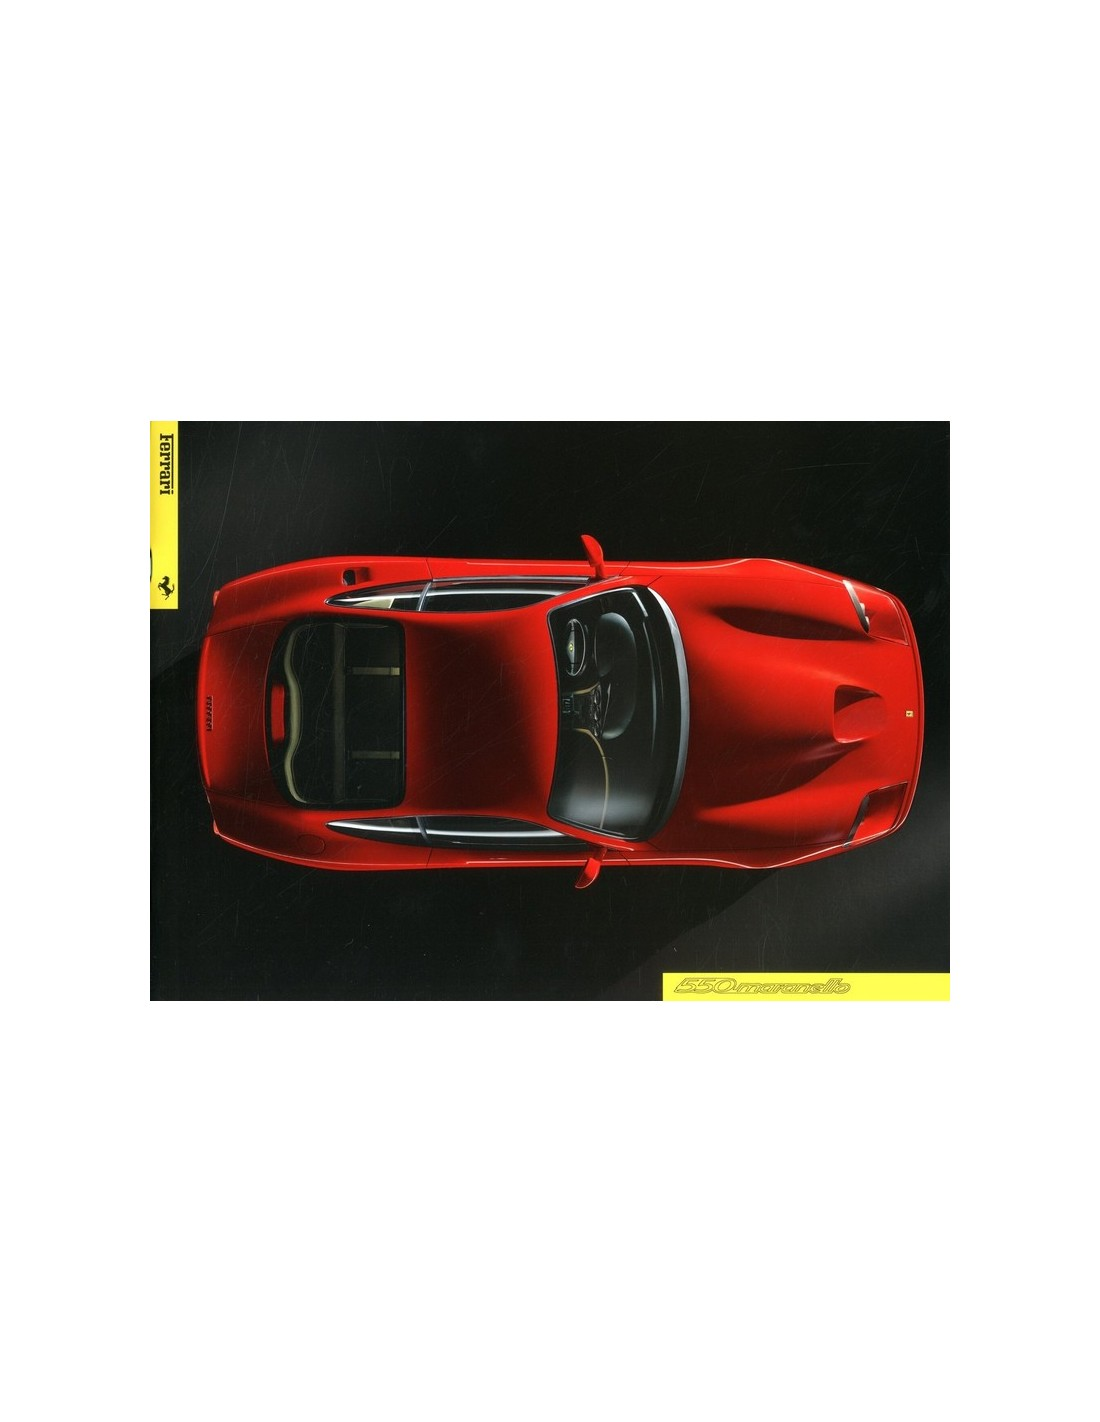 1996 Ferrari 550 Maranello Brochure 1101 96